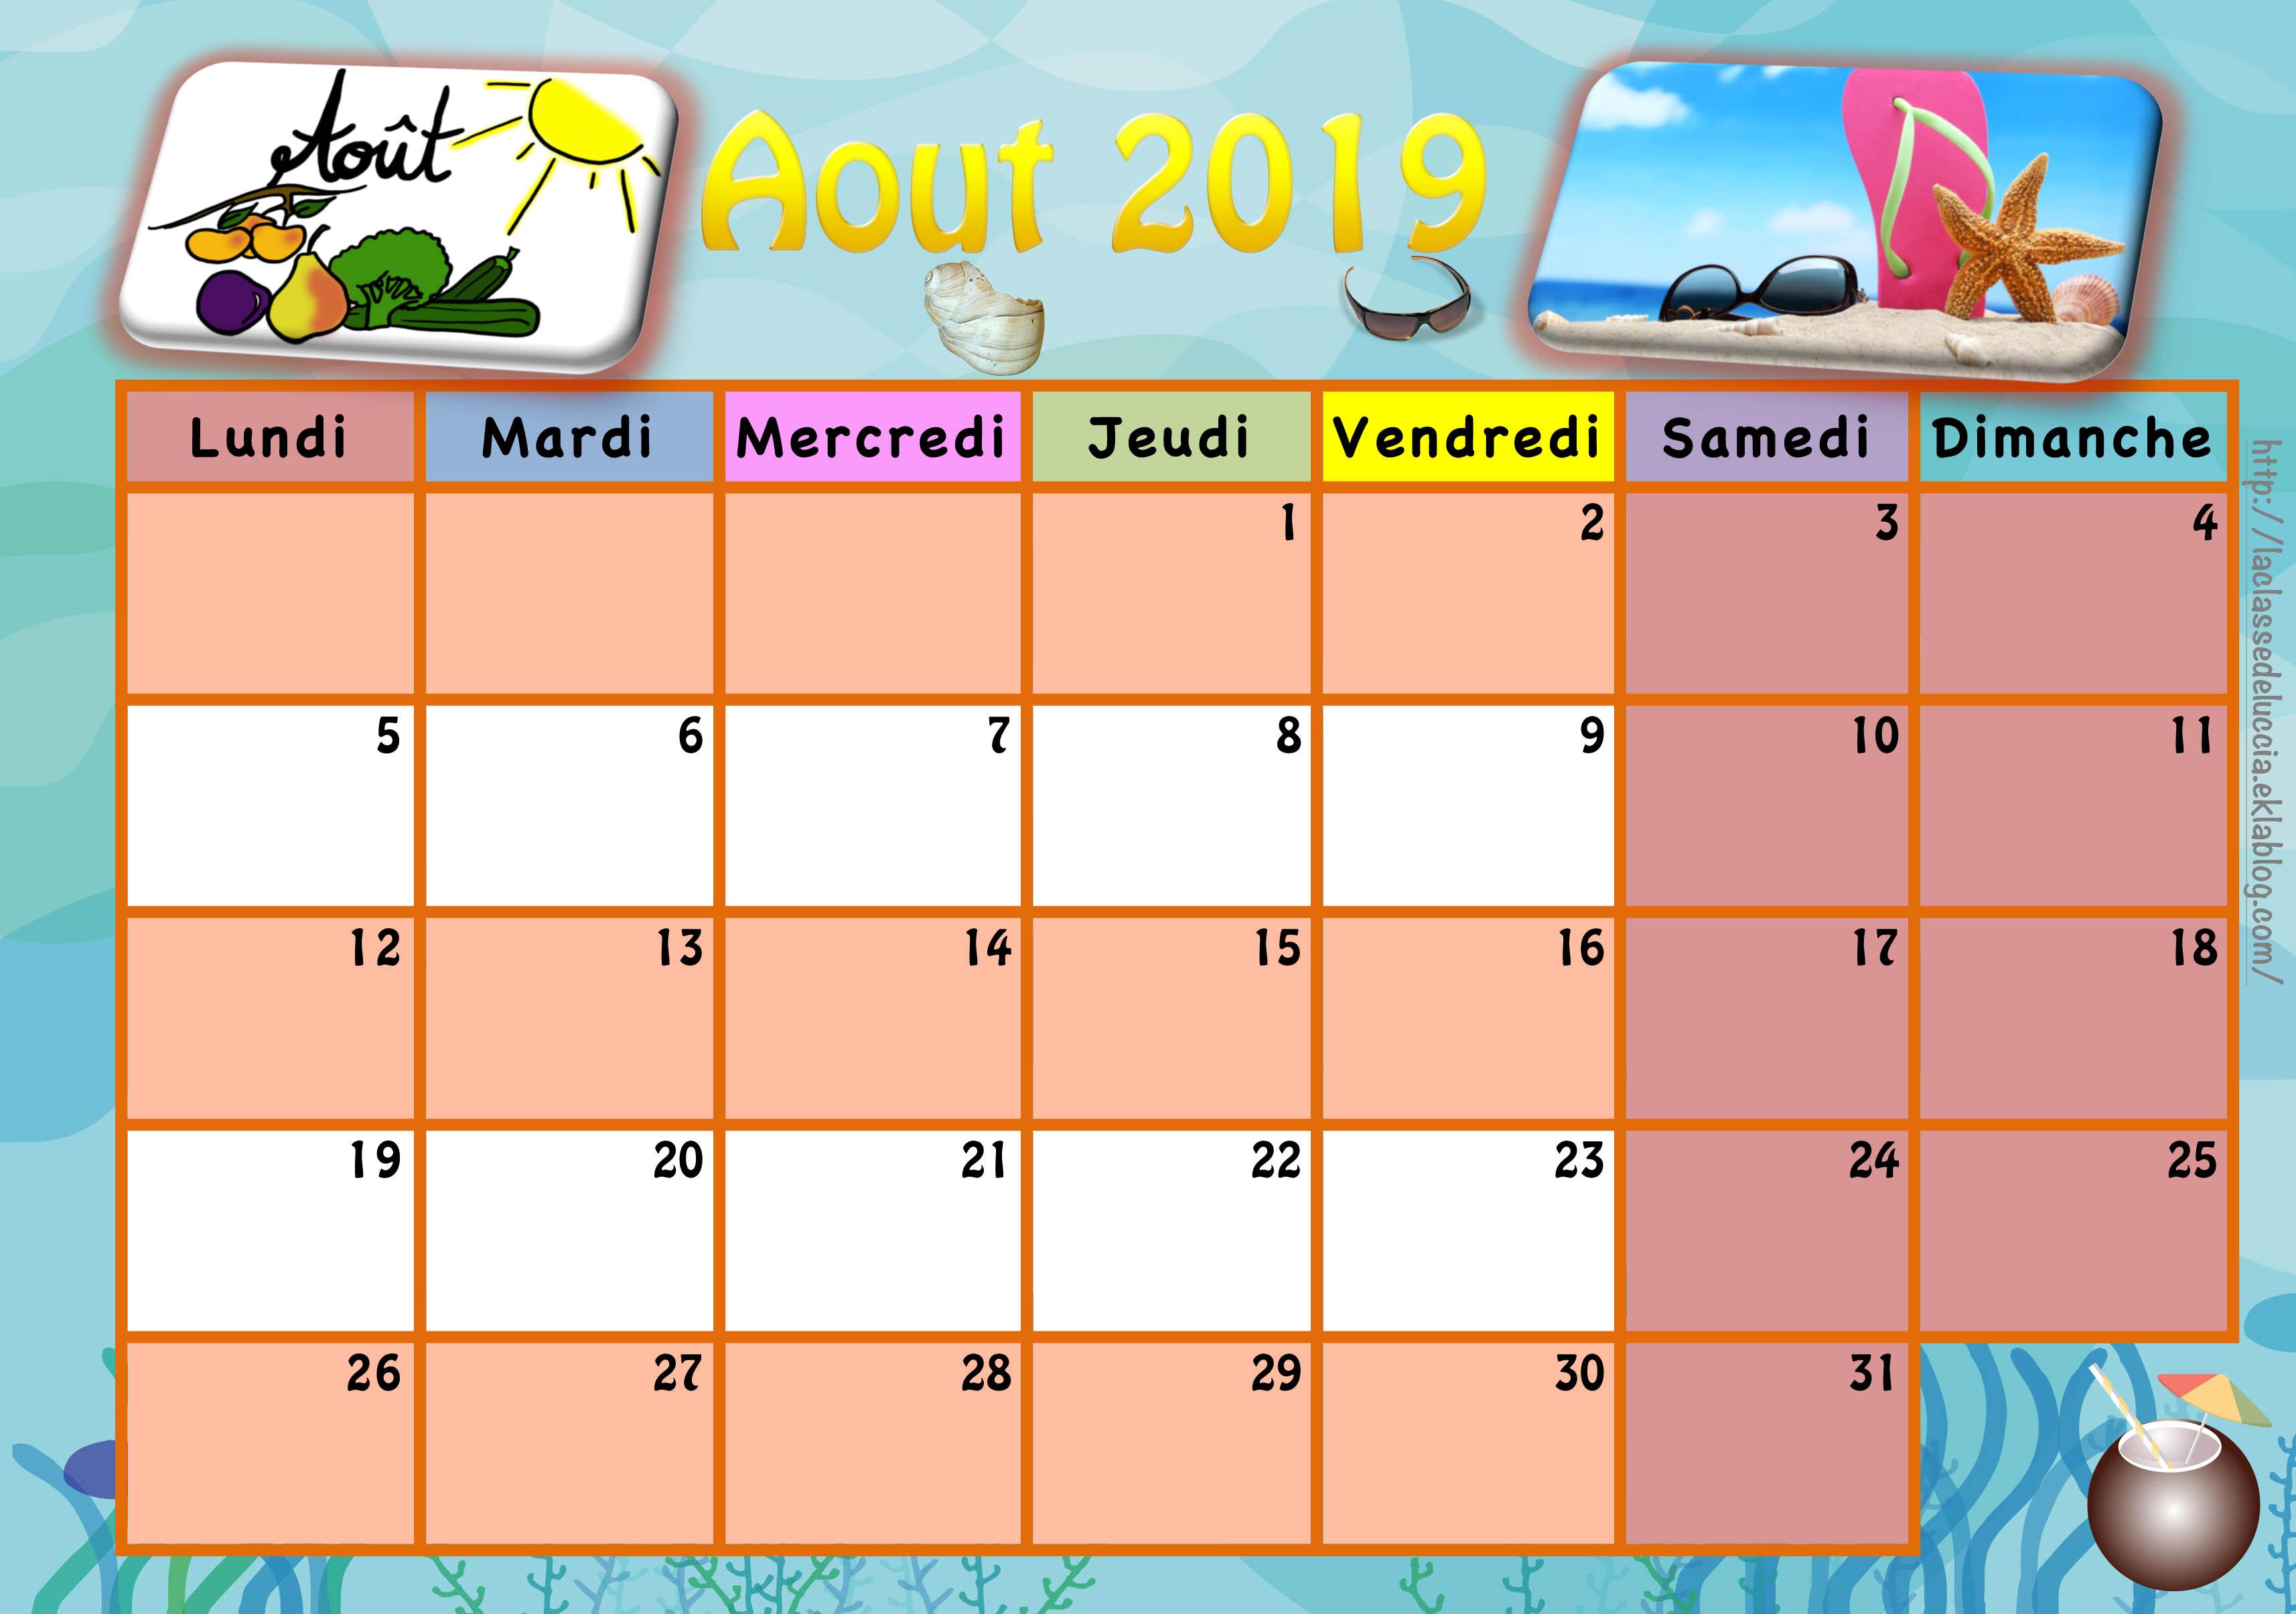 Calendrier Ludique A Imprimer 2020.Calendrier Enfant 2019 2020 La Classe De Luccia